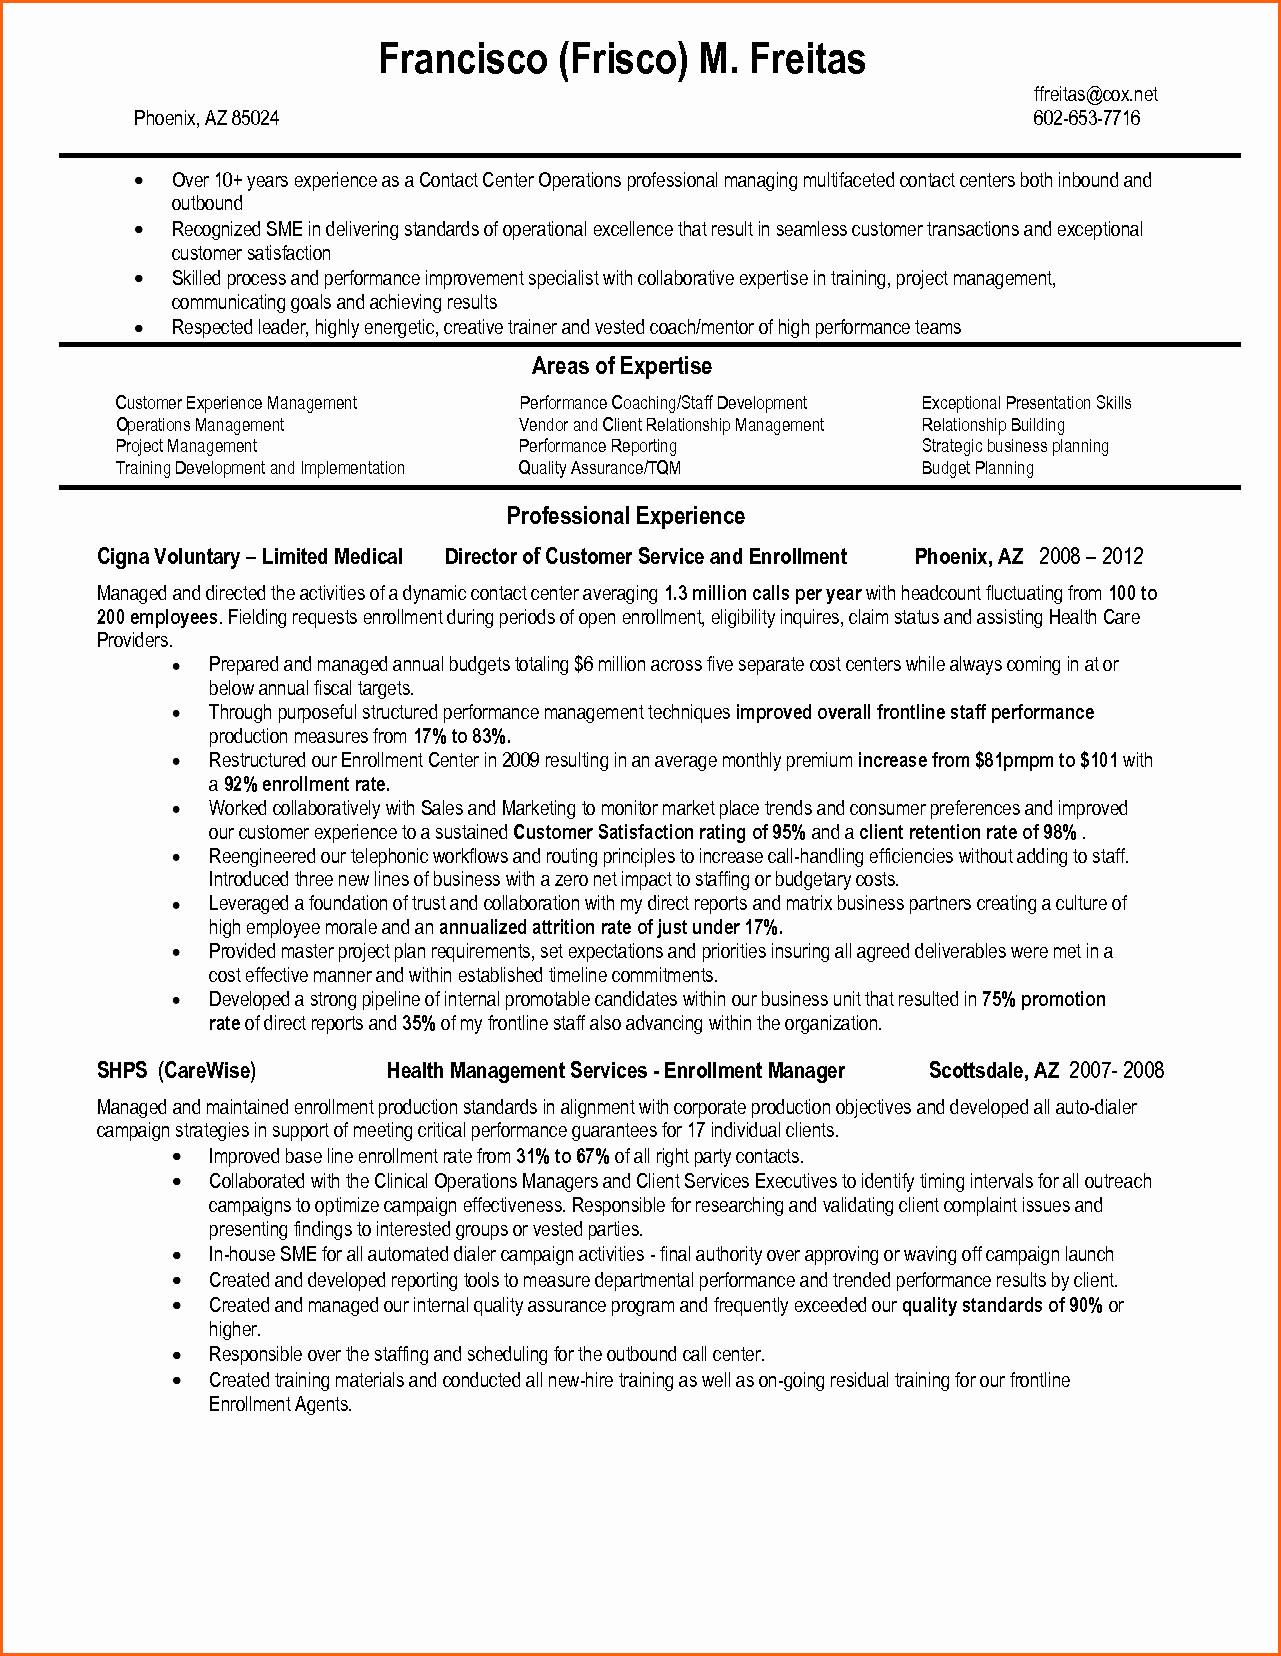 Call Center Quality Assurance Form Template